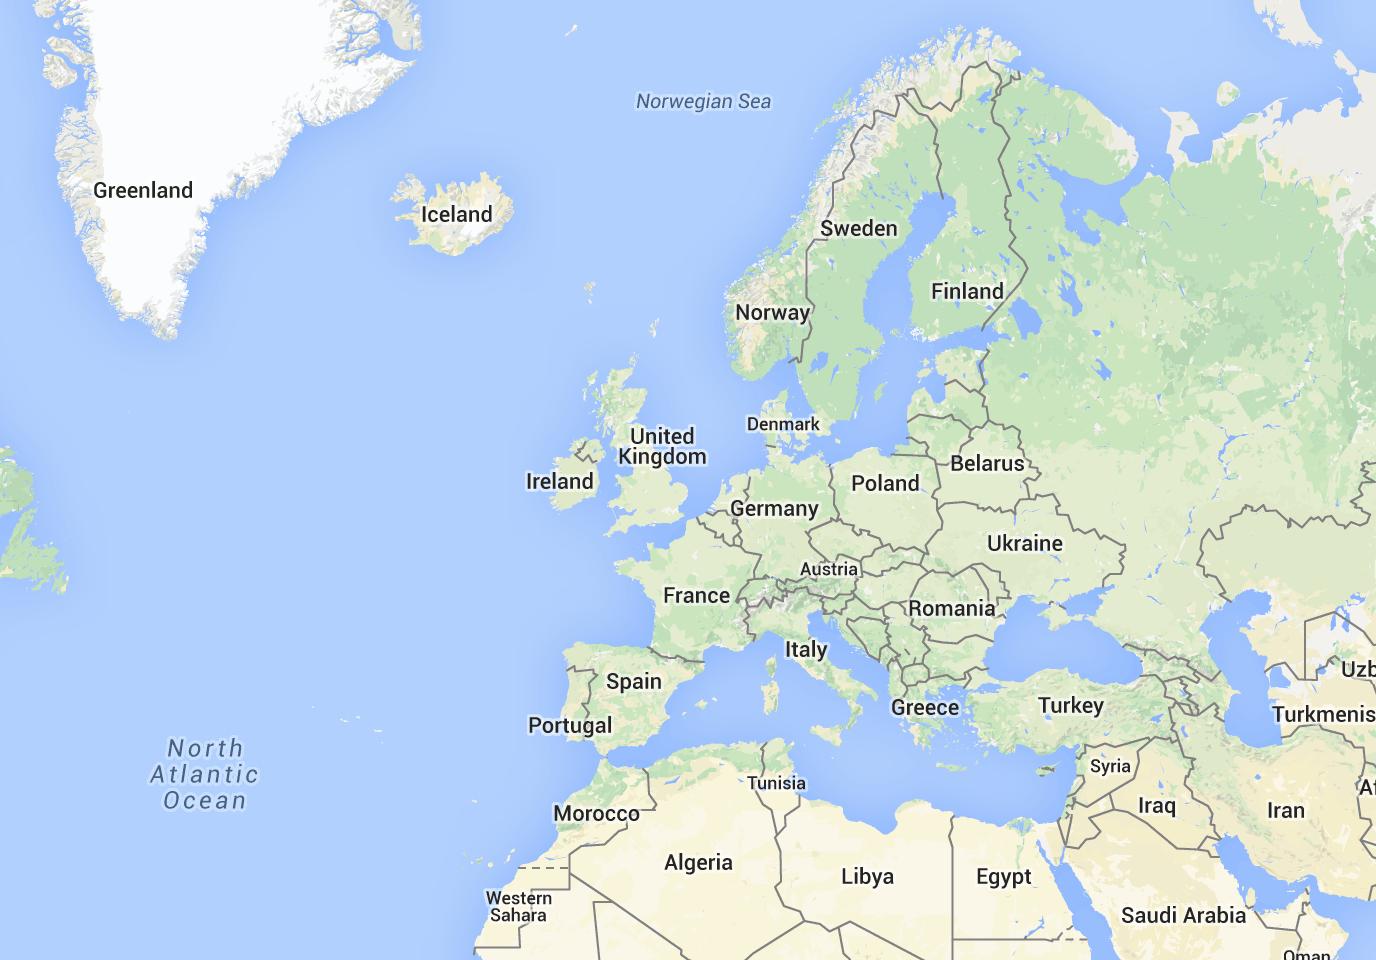 Msk Ultrasound Mentoring Days The Ultrasound Site Poland Germany Map Greenland Iceland